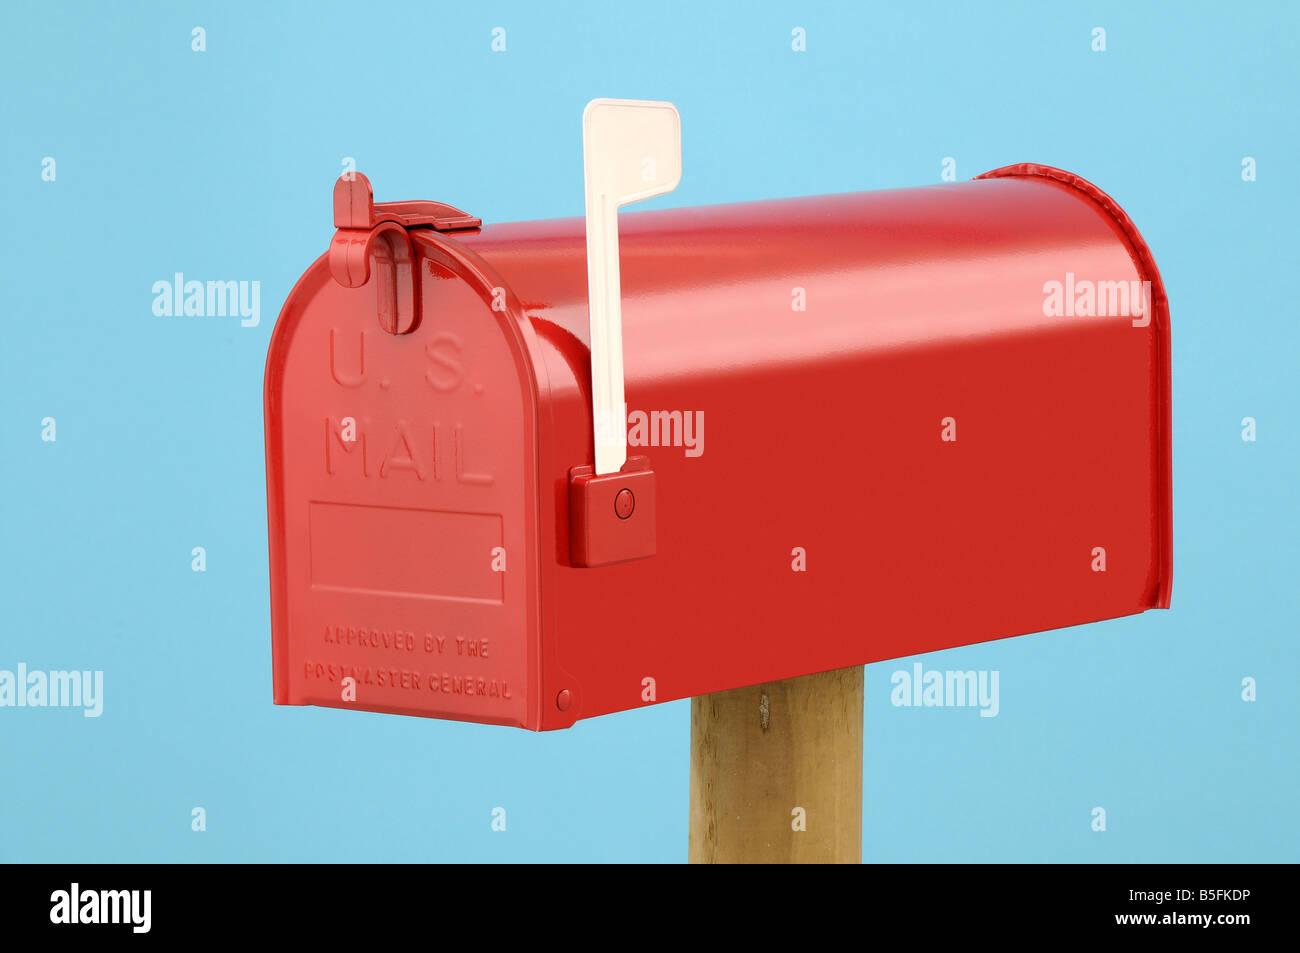 US Mailbox - Stock Image